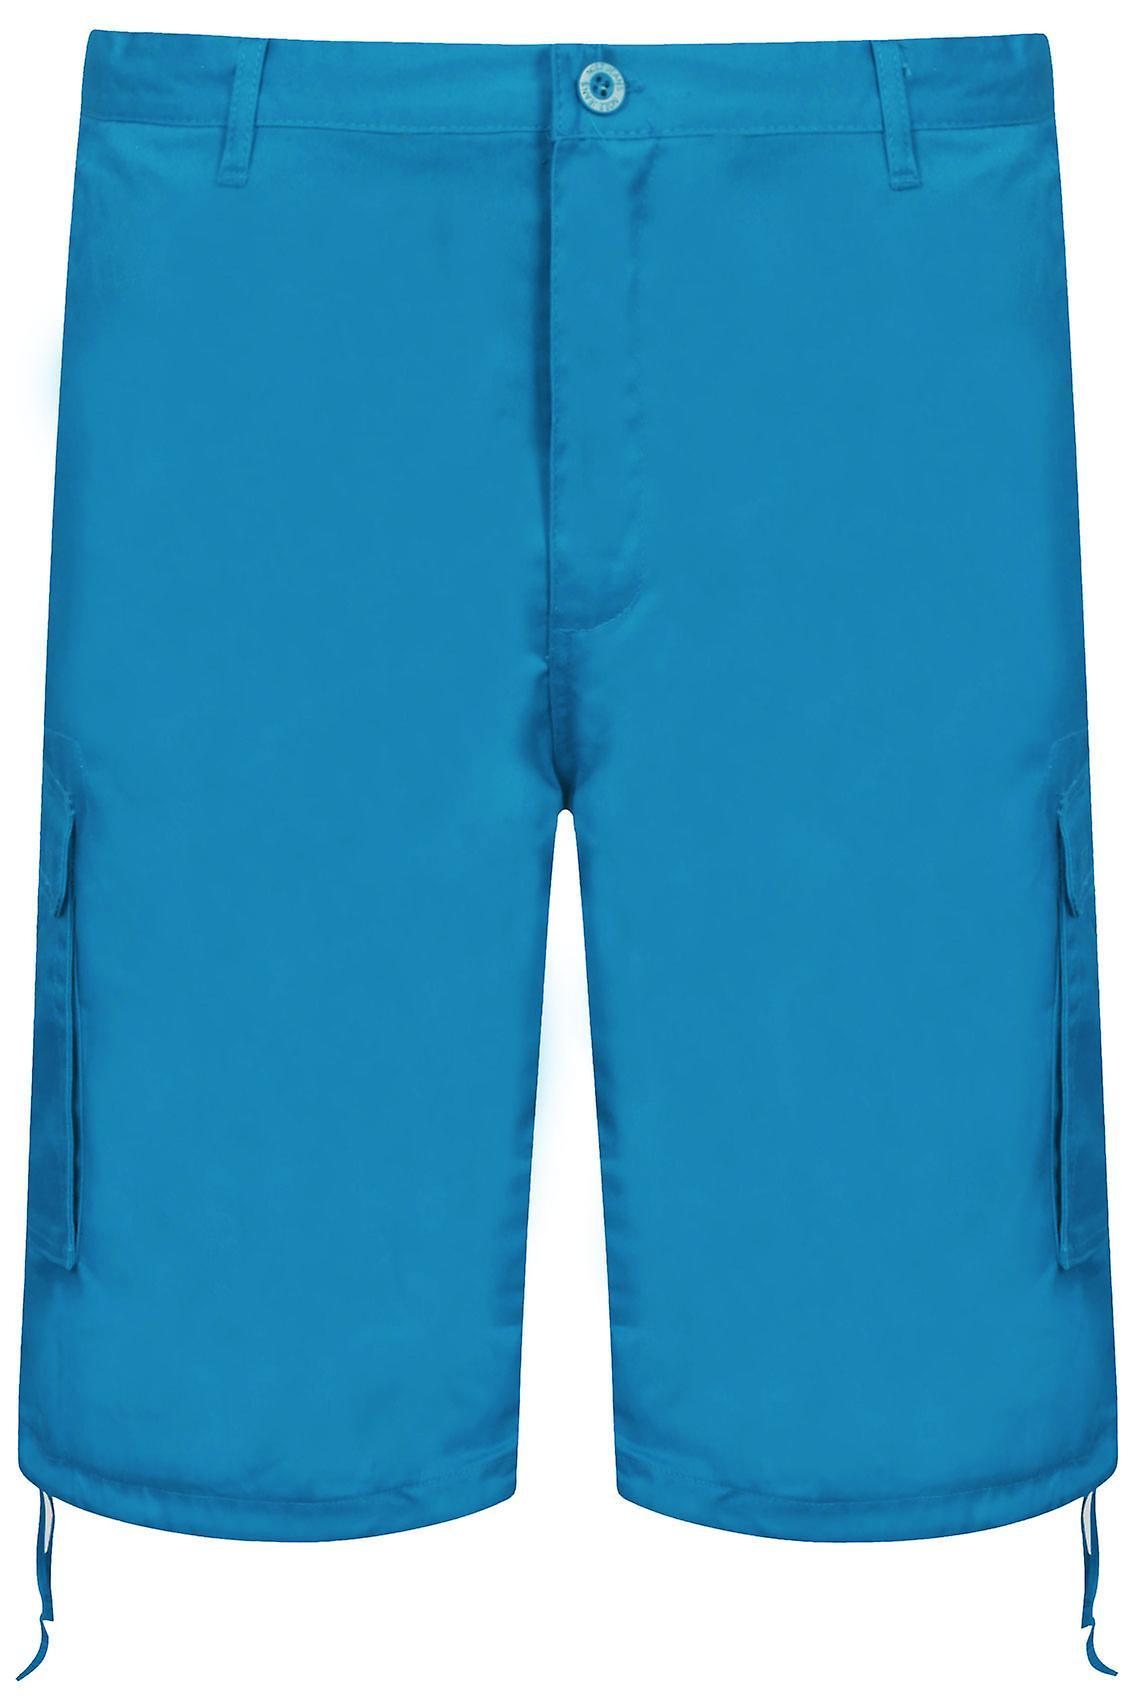 NOIZ Turquoise Cotton Cargo Shorts With Pockets